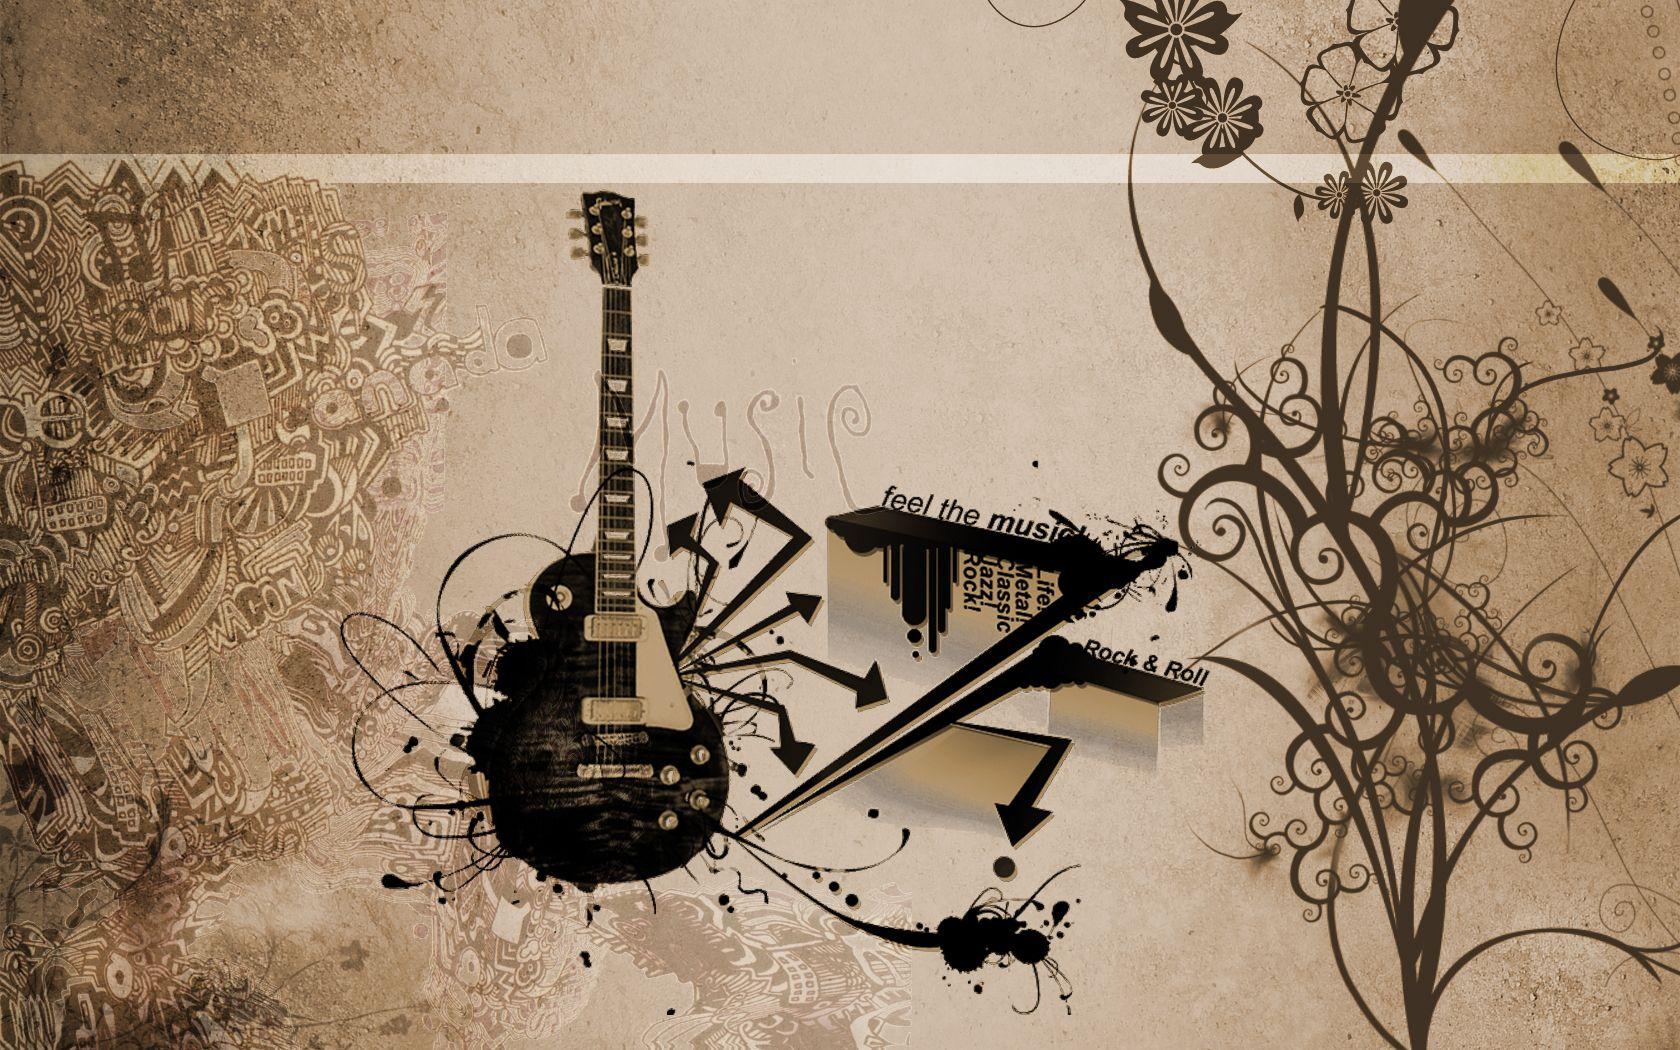 Cool Wallpaper Music Painting - 3c38c902e457acfc4b6bd118582dccde  You Should Have_45430.jpg